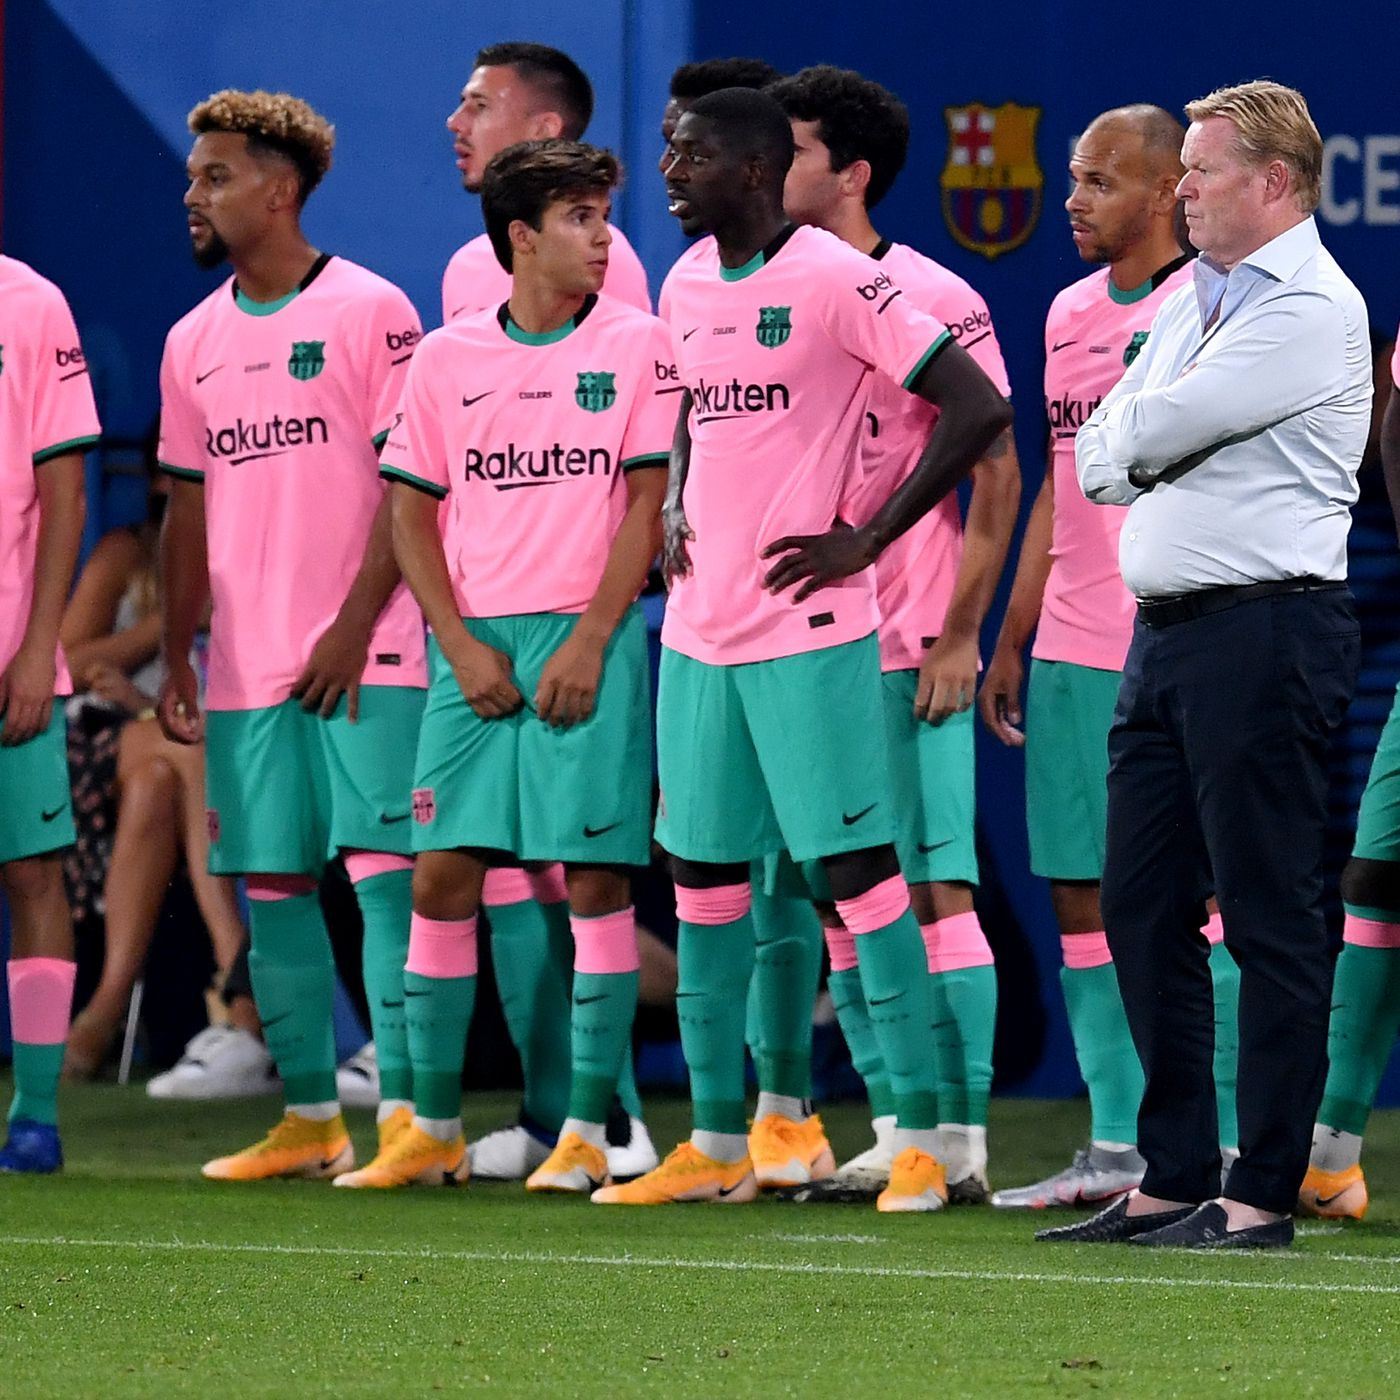 Barcelona Vs Girona Preseason Friendly Final Score 3 1 Young Stars Impress Again As Barca Win Again Barca Blaugranes